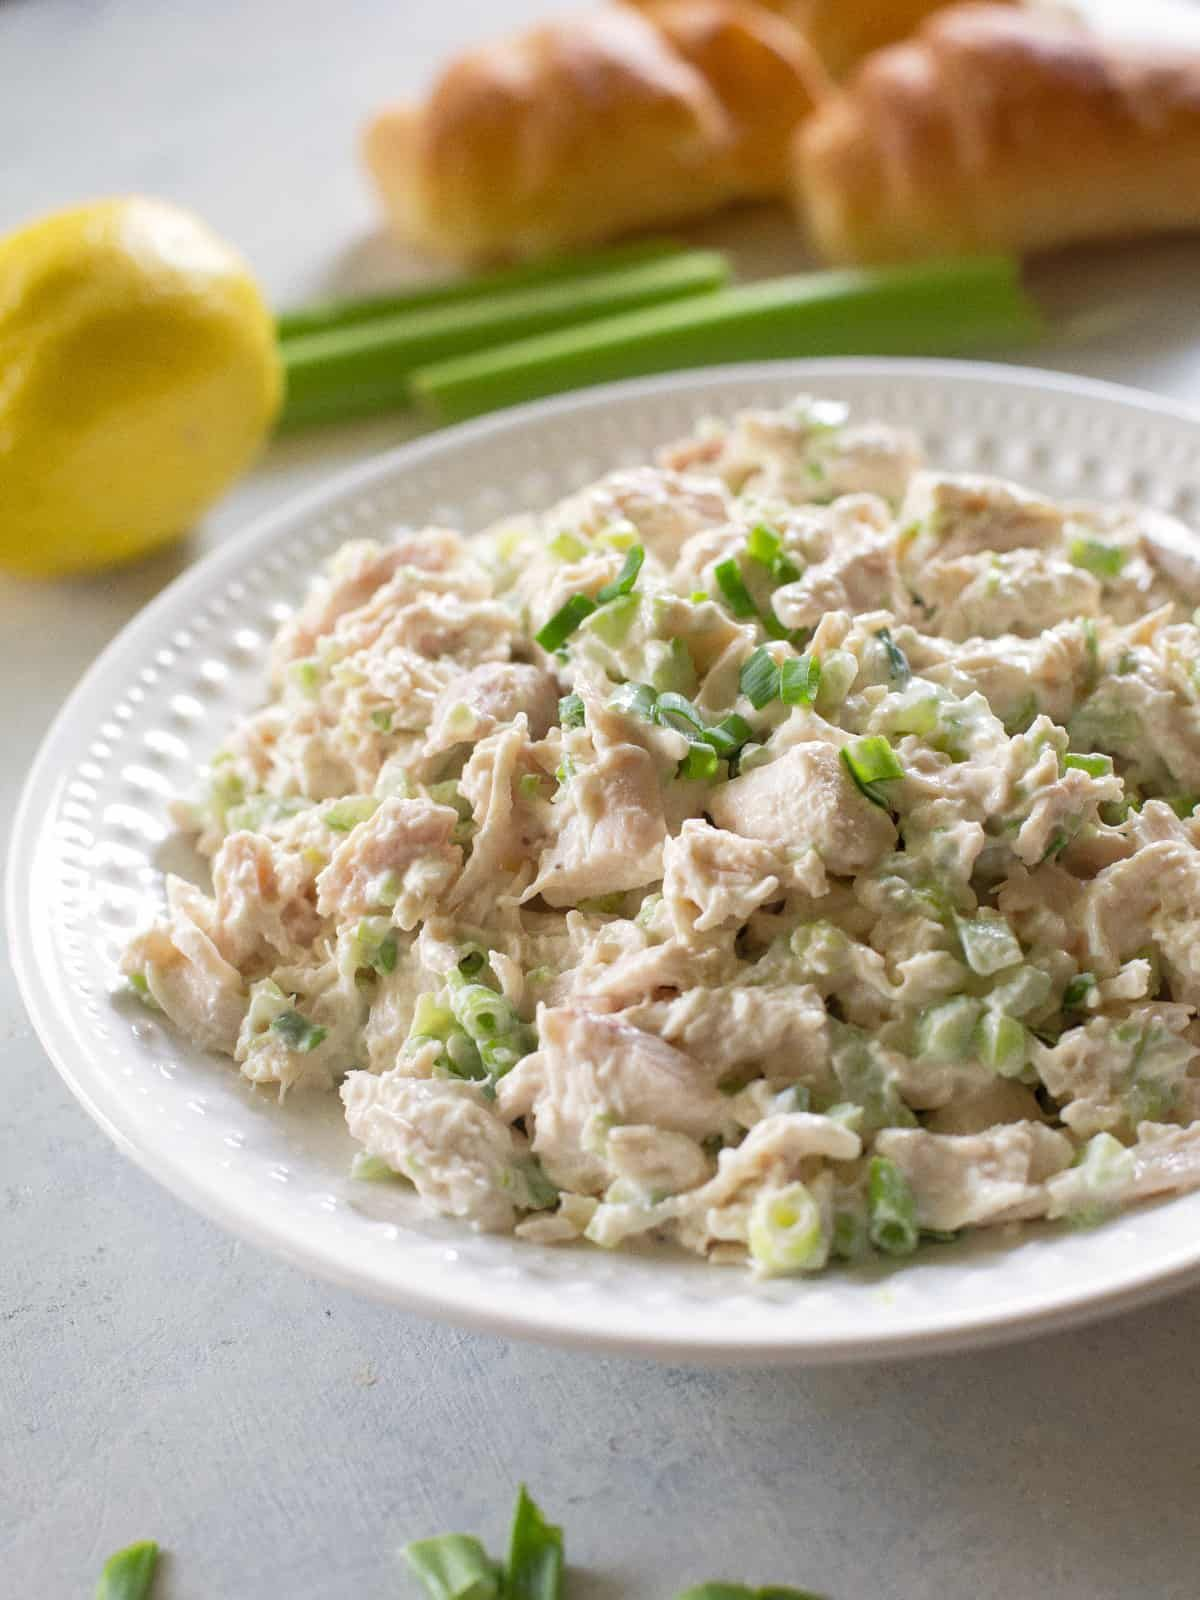 Chicken Salad Recipe Recipe Chicken Salad Recipes Best Chicken Salad Recipe Recipes